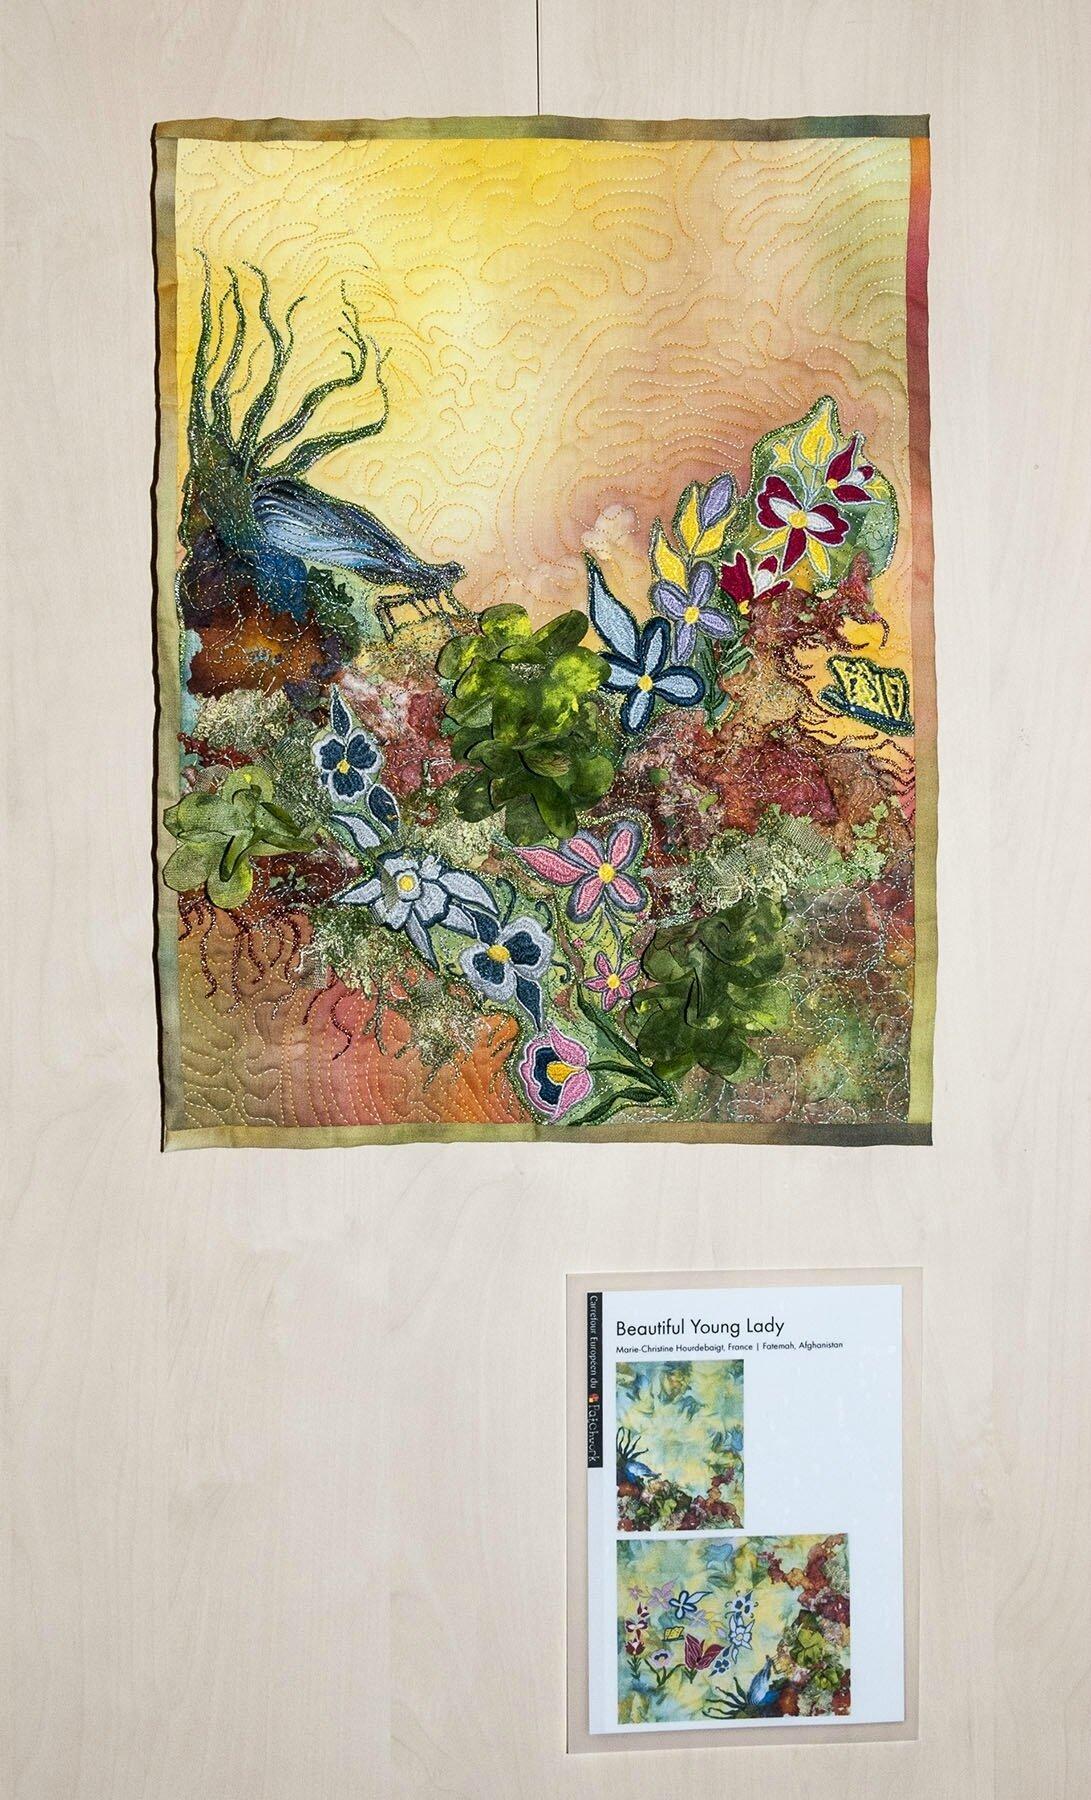 17052017-2017-05-17_18-59-49-Gardens Around the World et broderie Afghanne-QES 2017